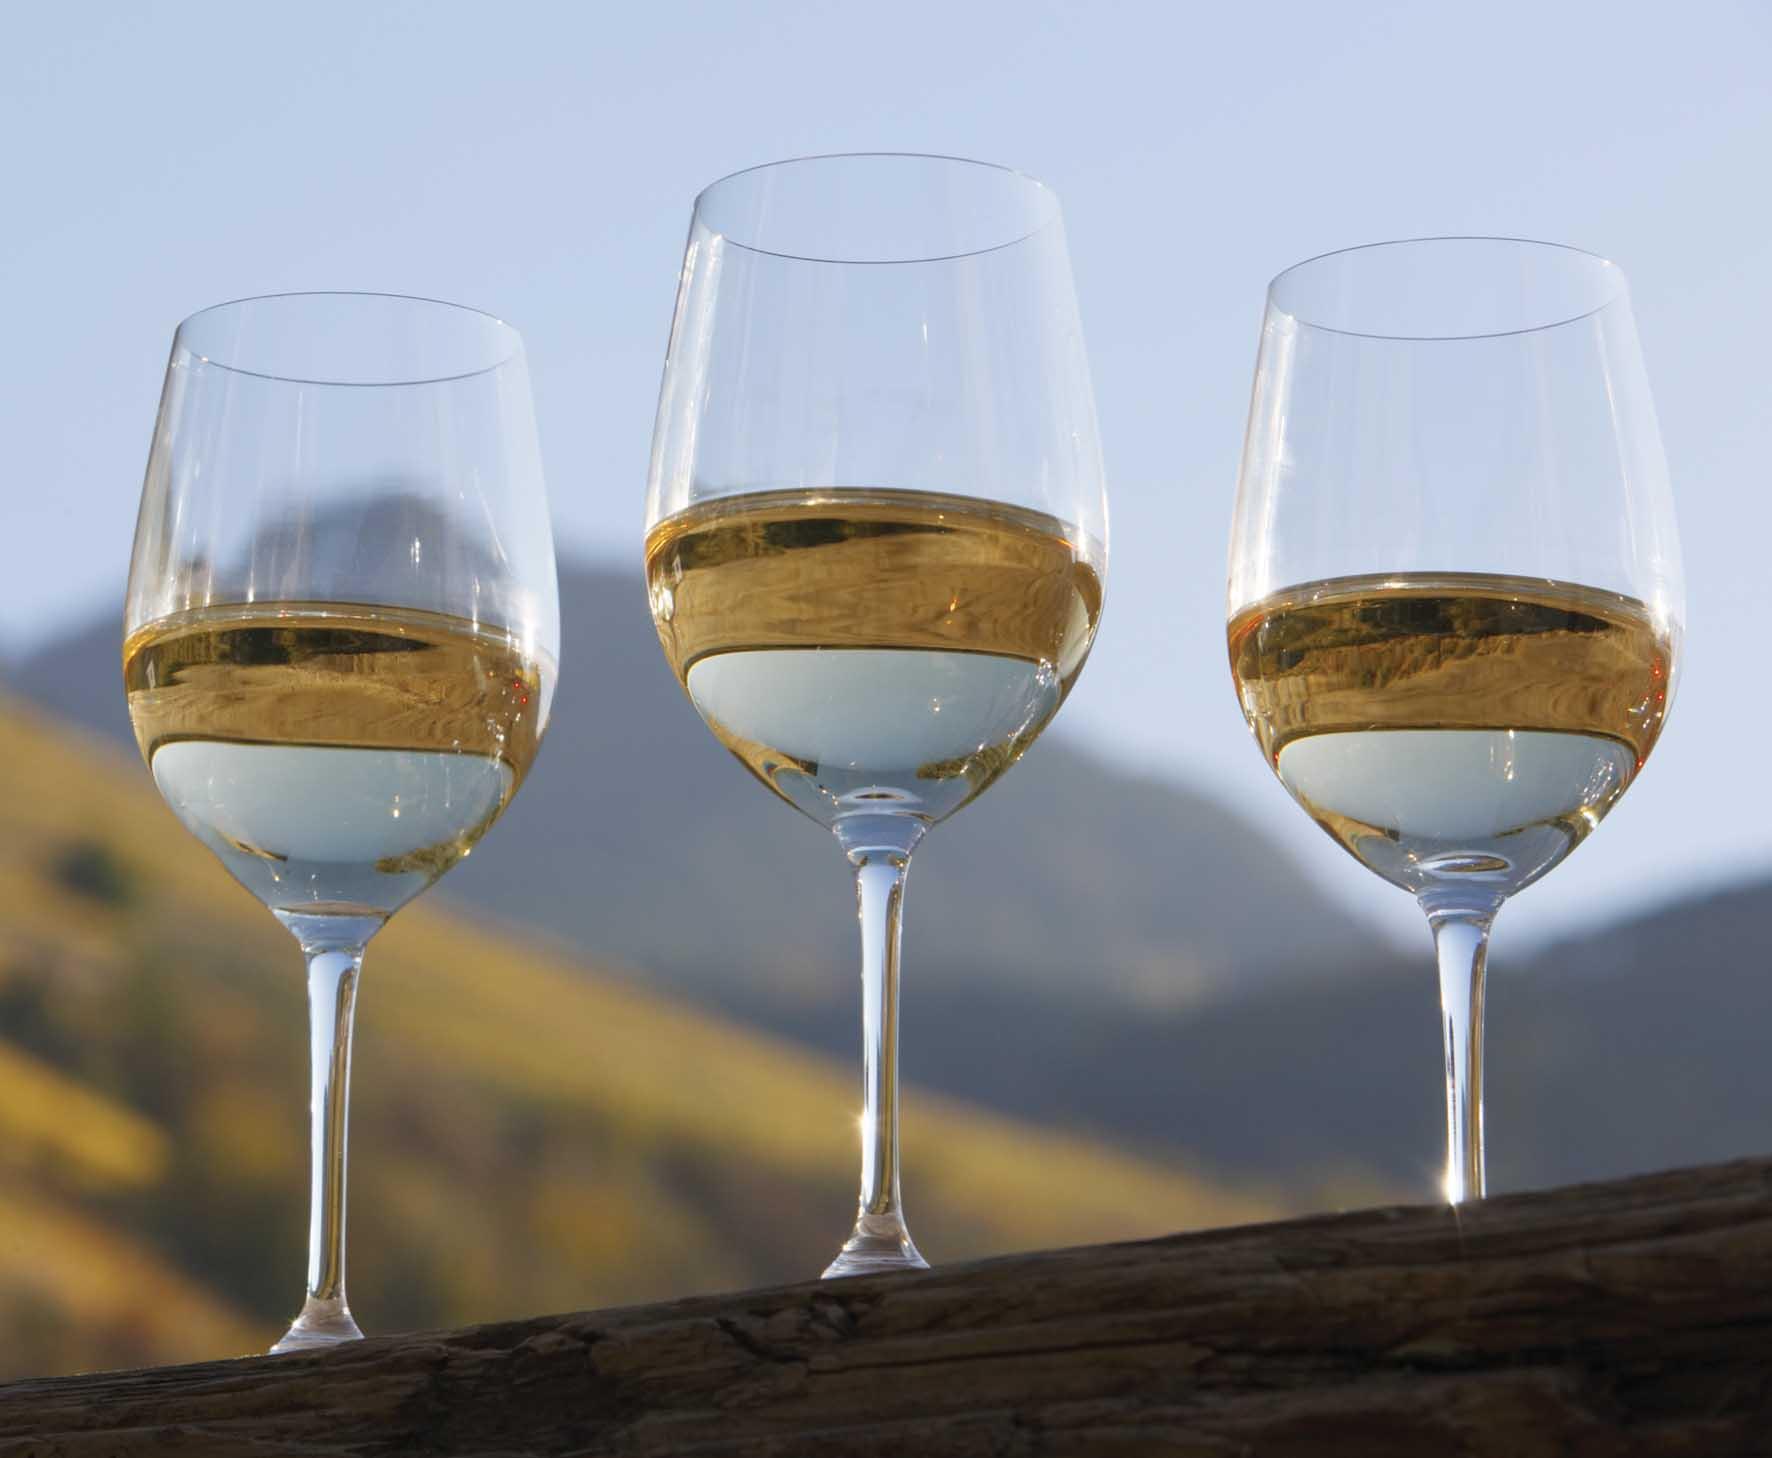 Vini Alto ADige vini-bianchi-bicchieri-eos-frieder-blickle 1